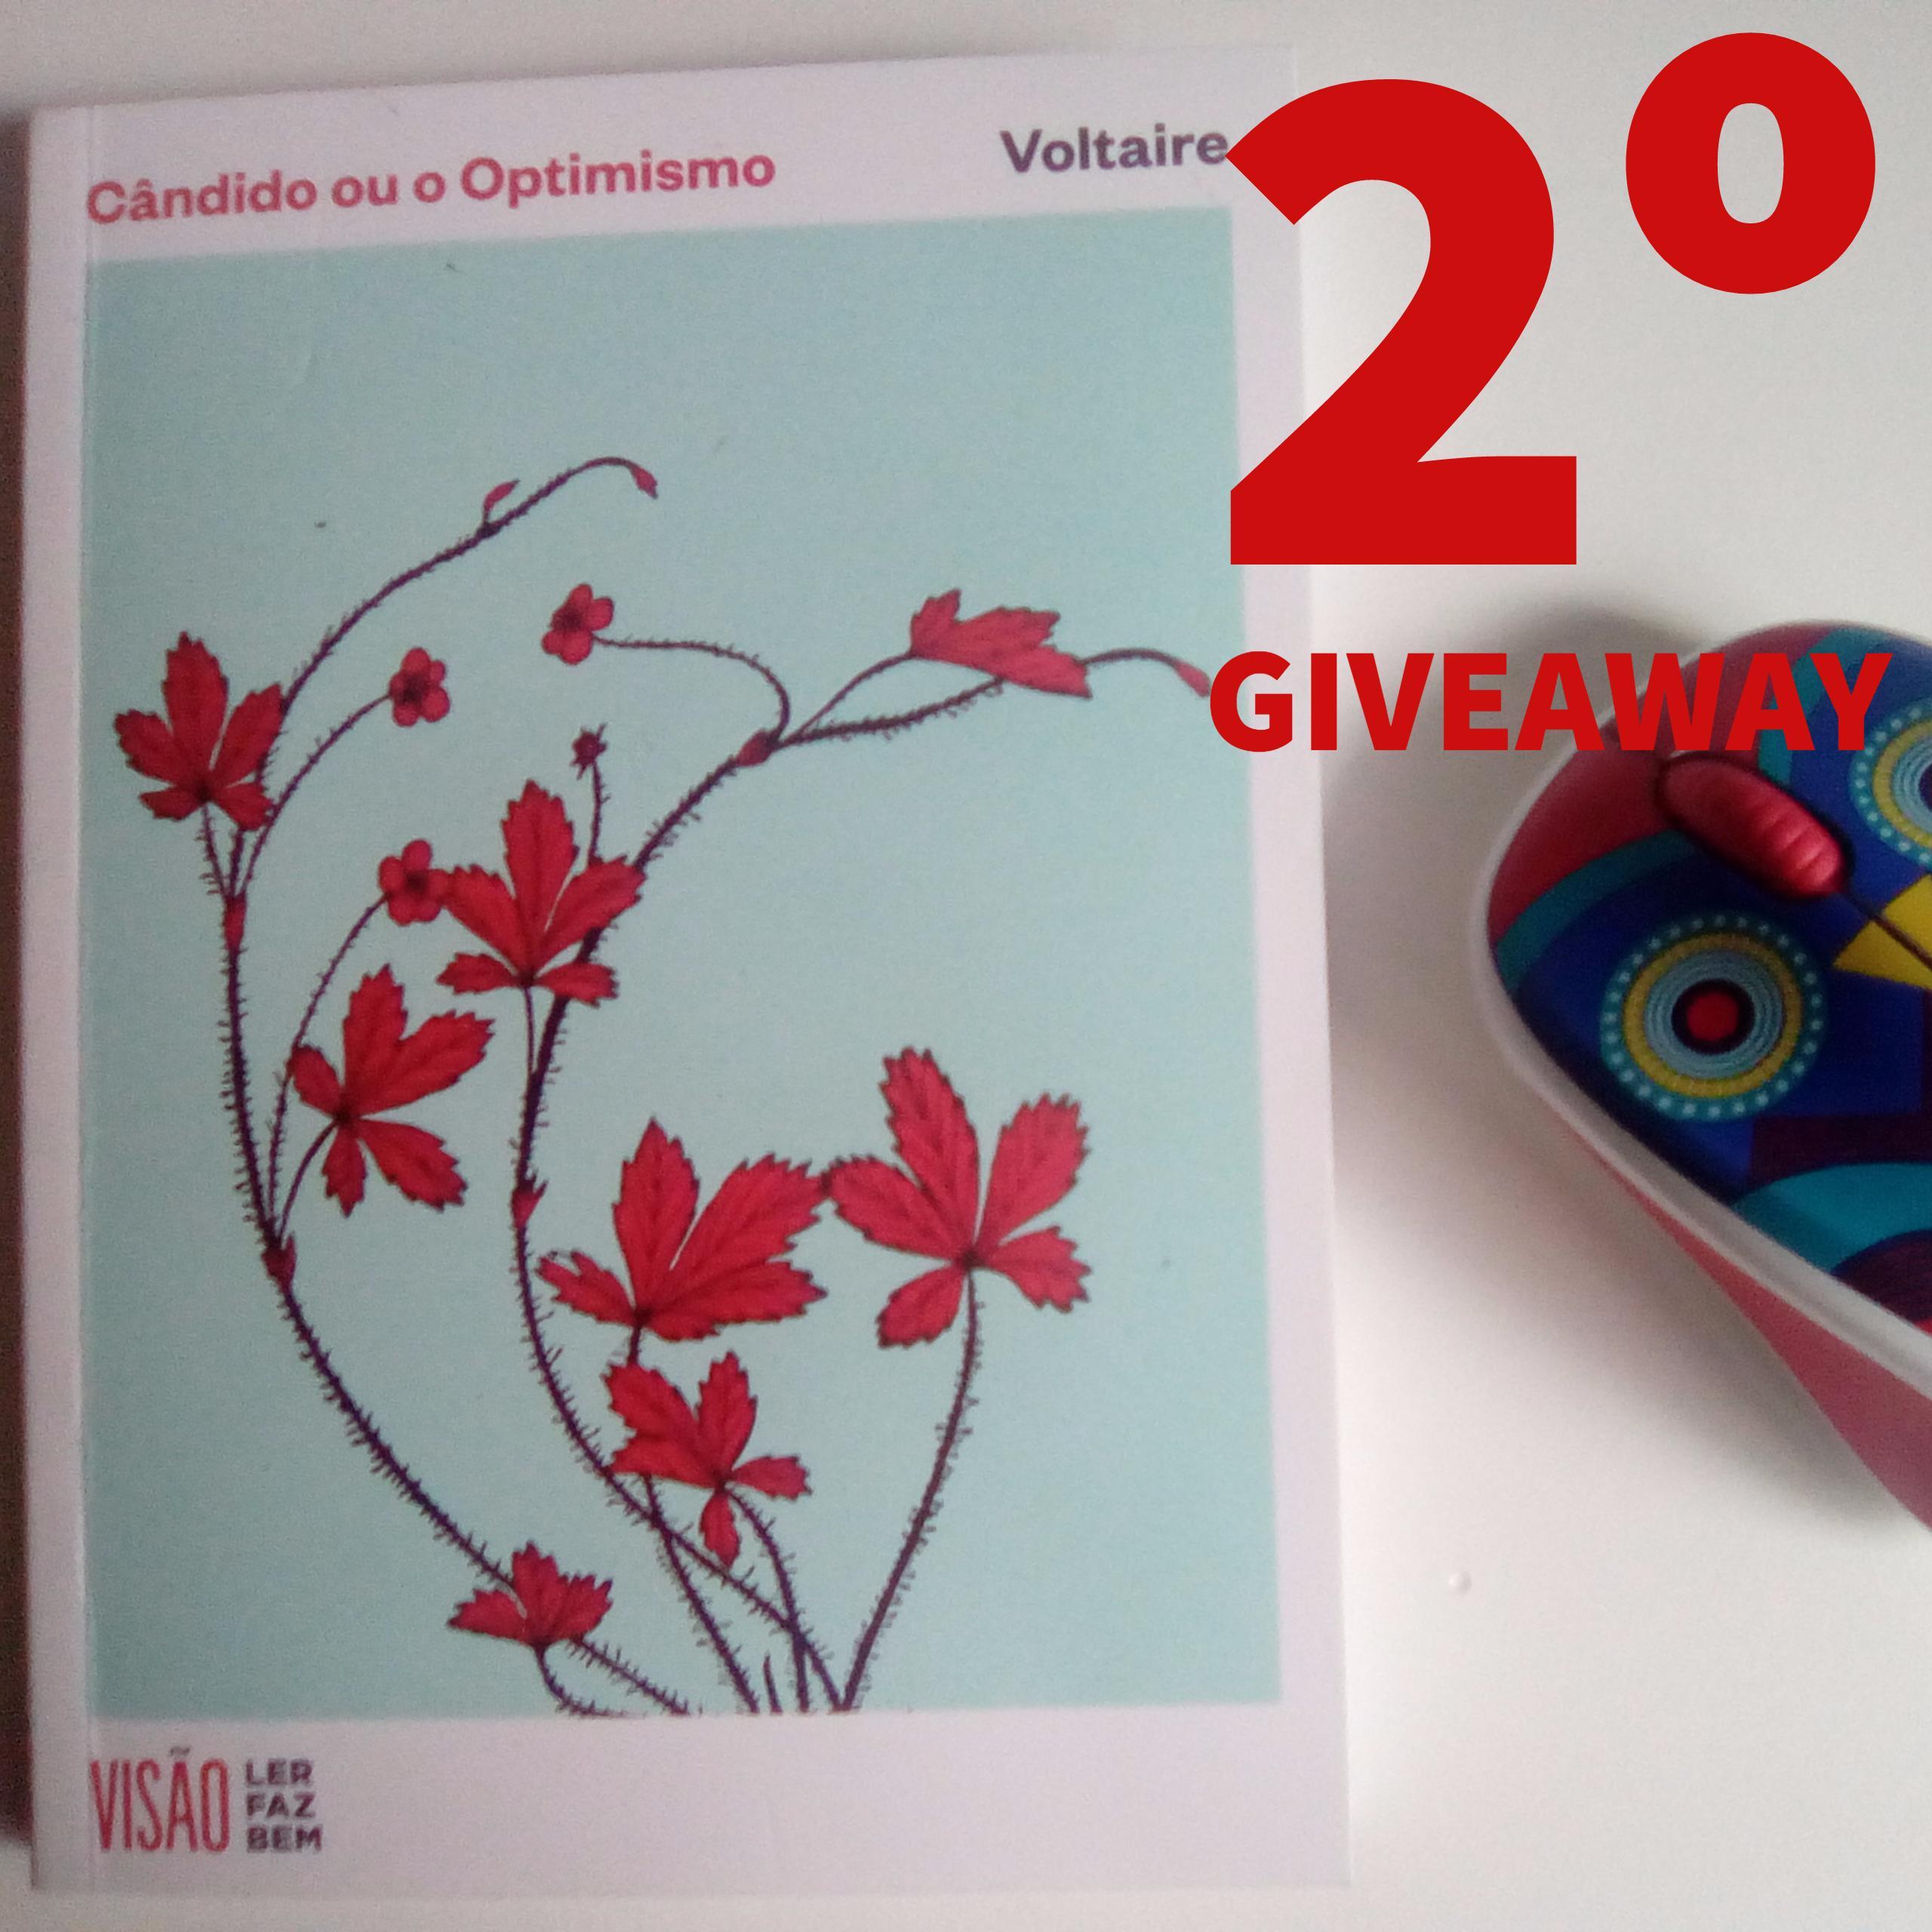 2º Giveaway – Cândido